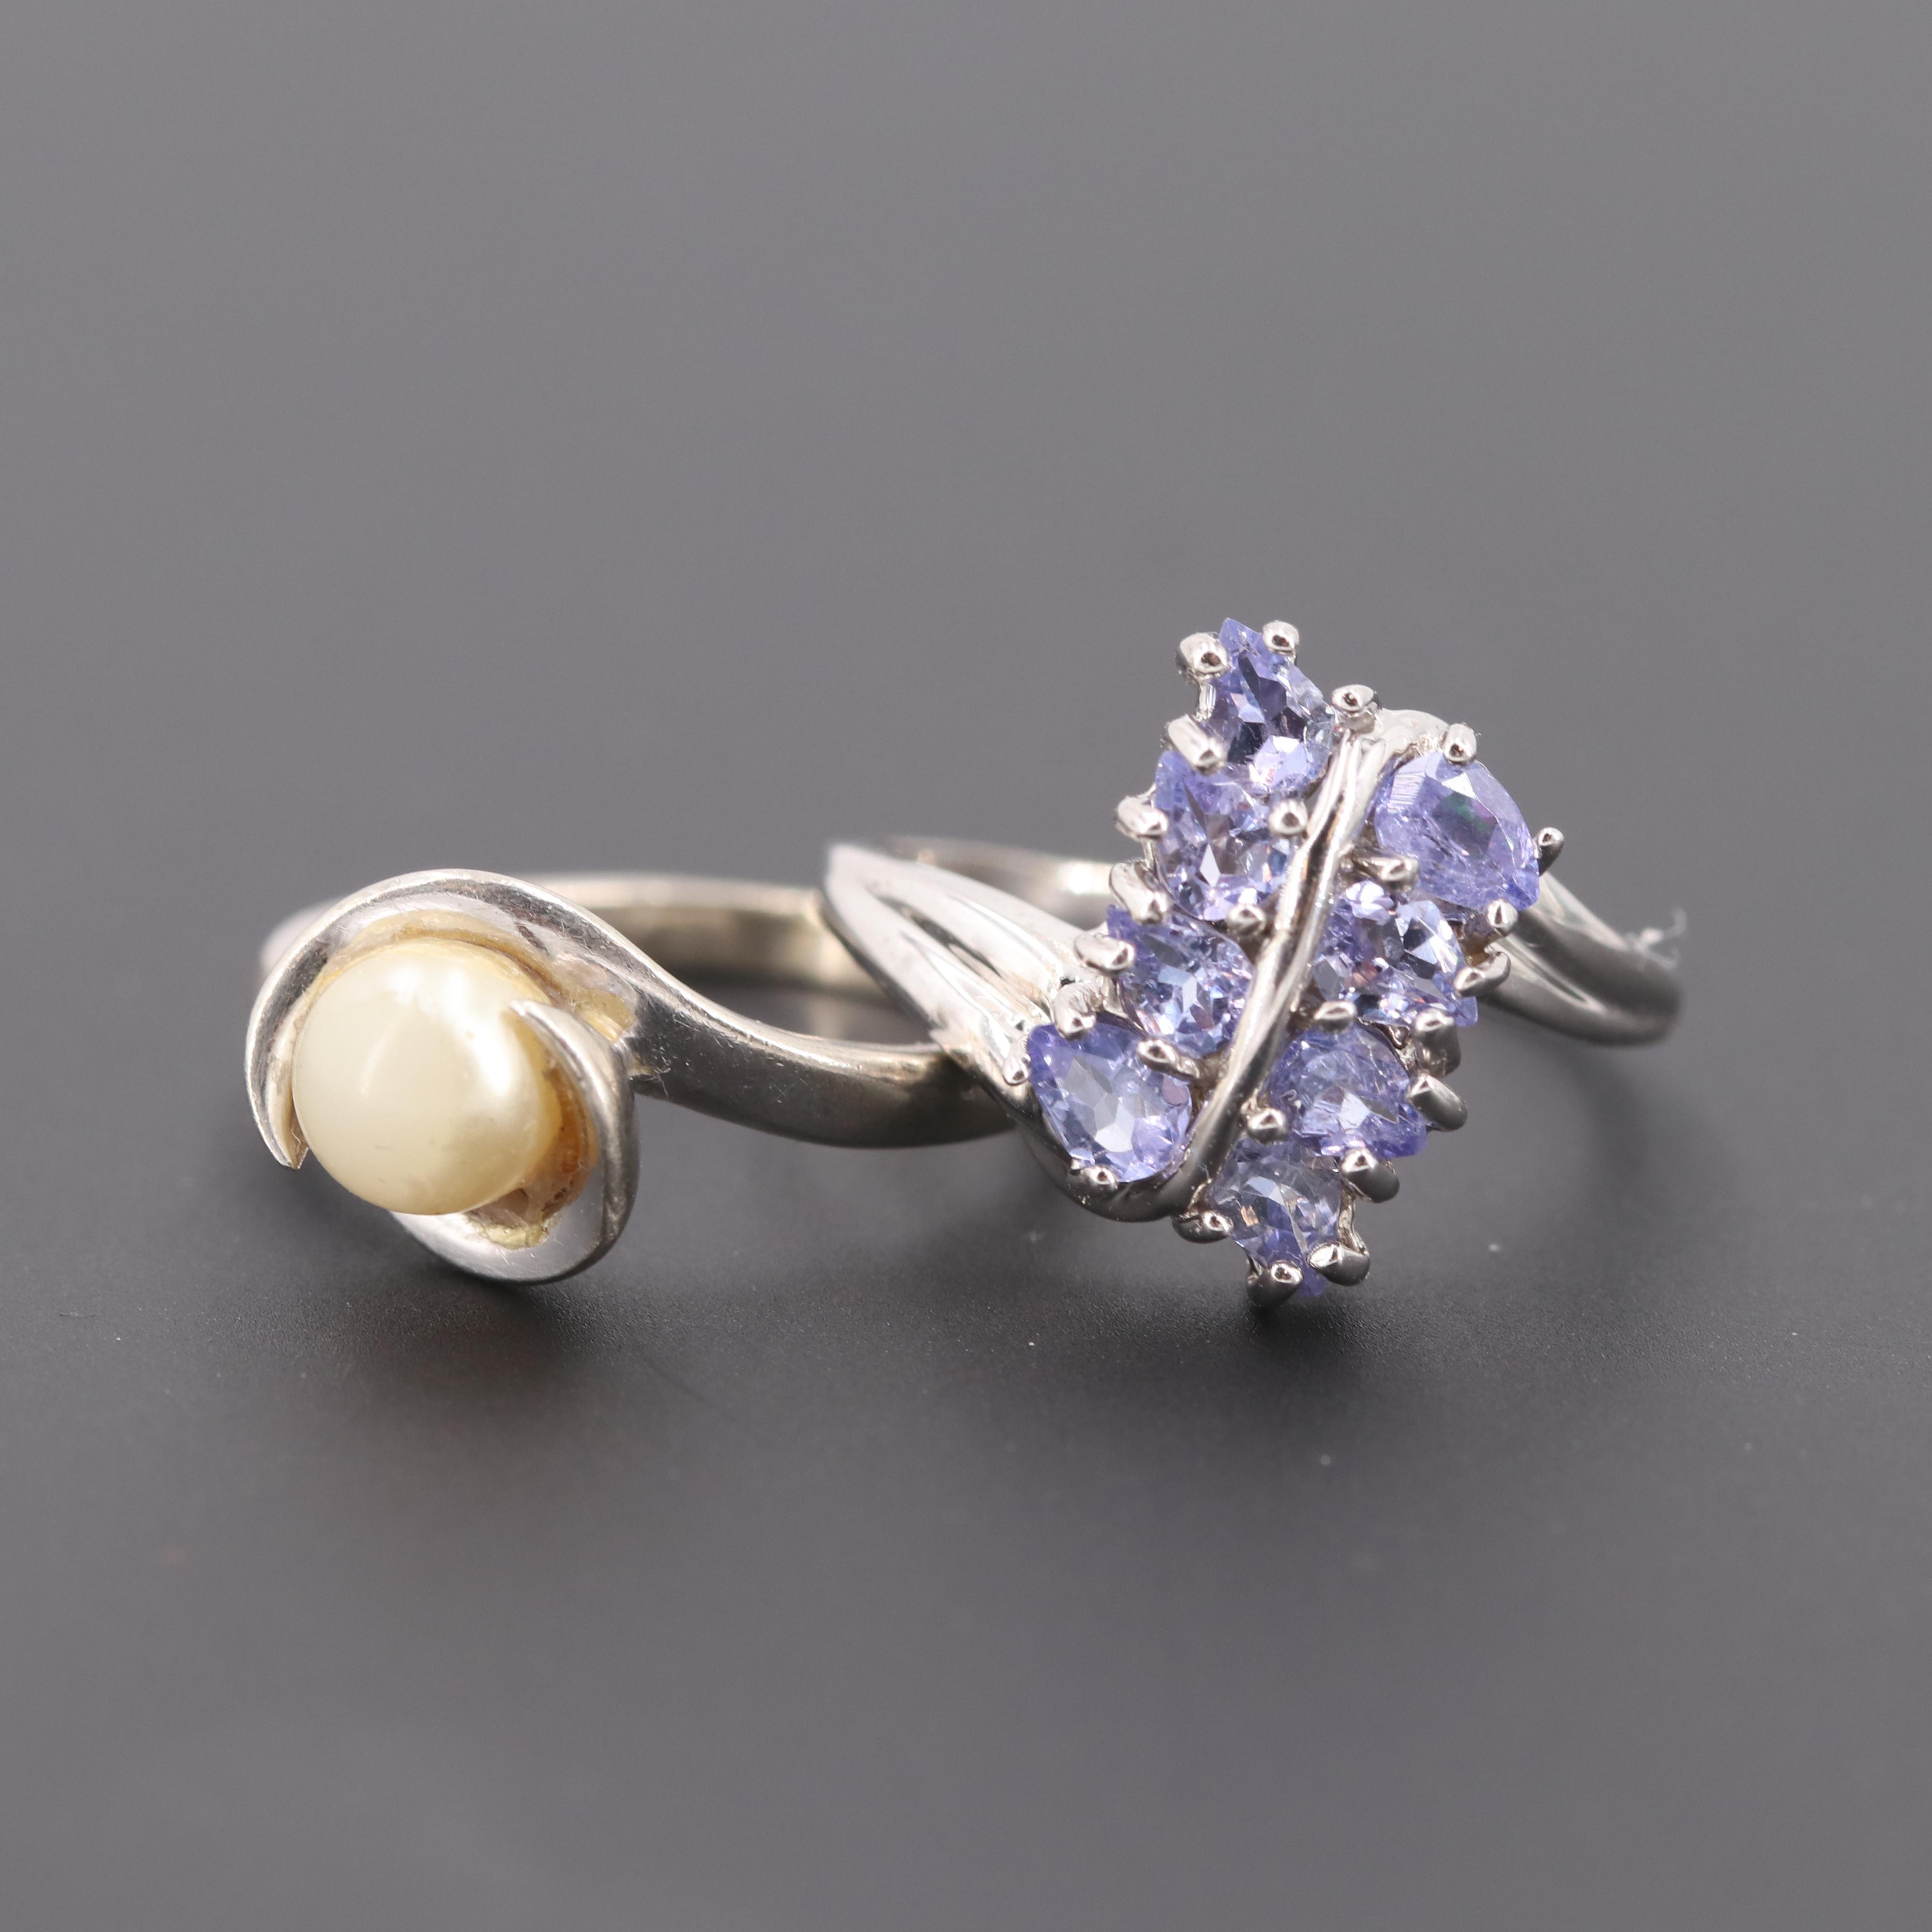 10K White Gold Imitation Pearl and 14K White Gold Tanzanite Rings